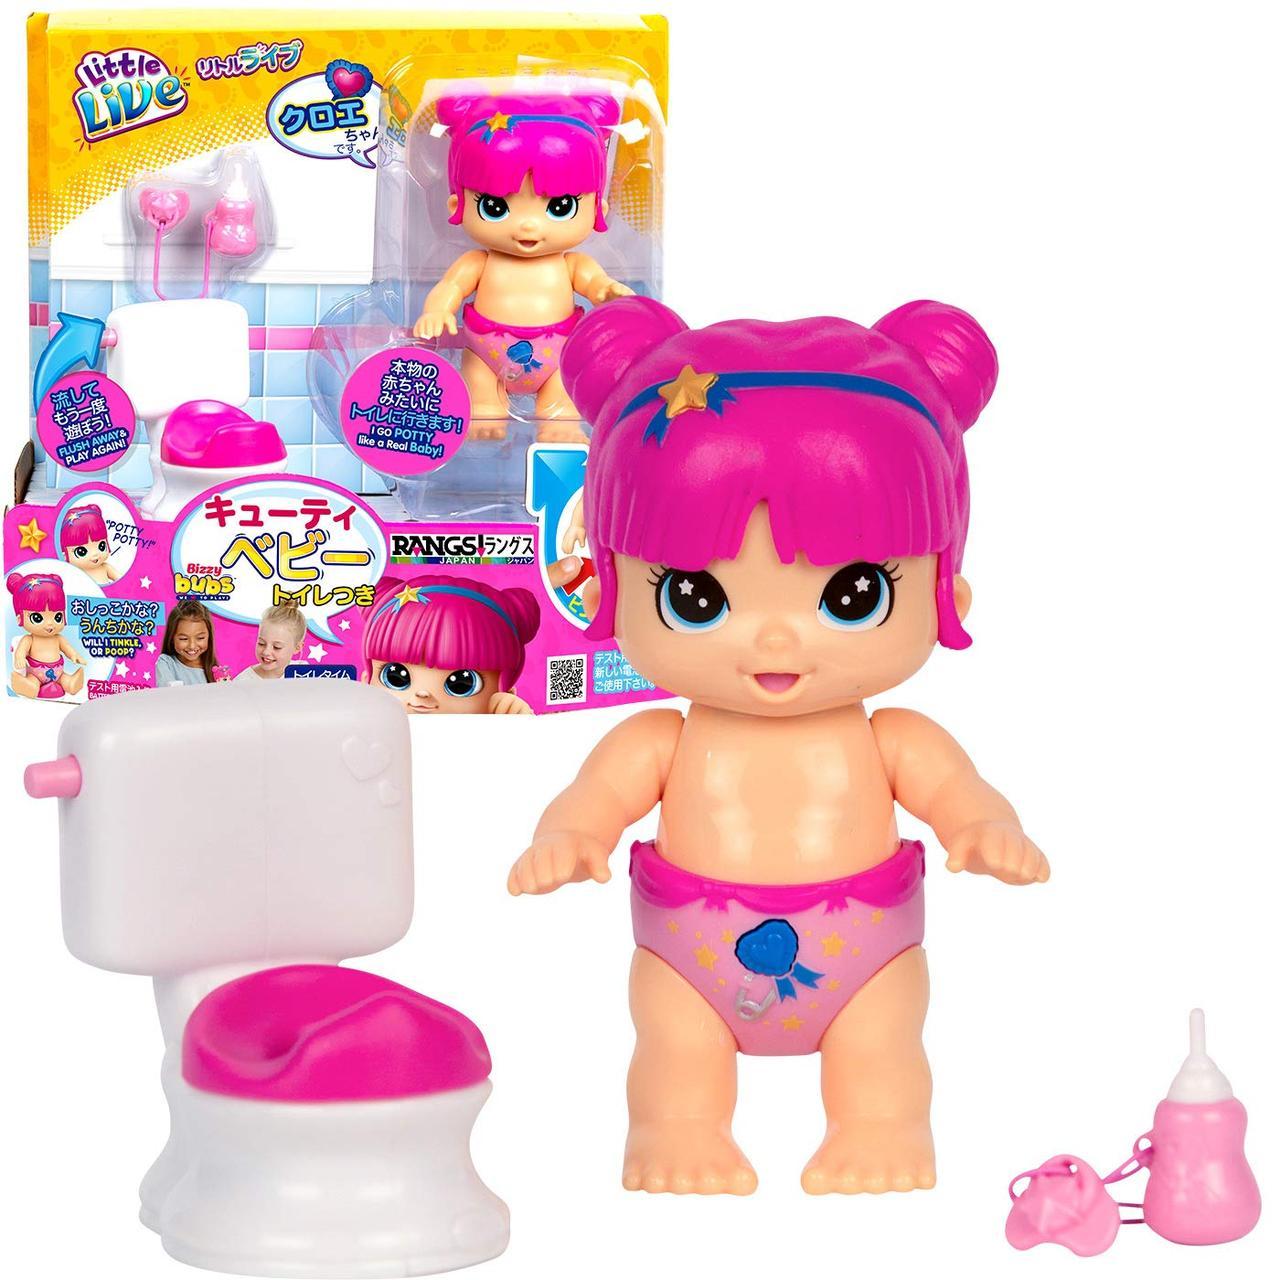 Интерактивная куколка с горшком, Little Live Bizzy Bubs Clever Chloe Potty Time, Moose Оригинал из США